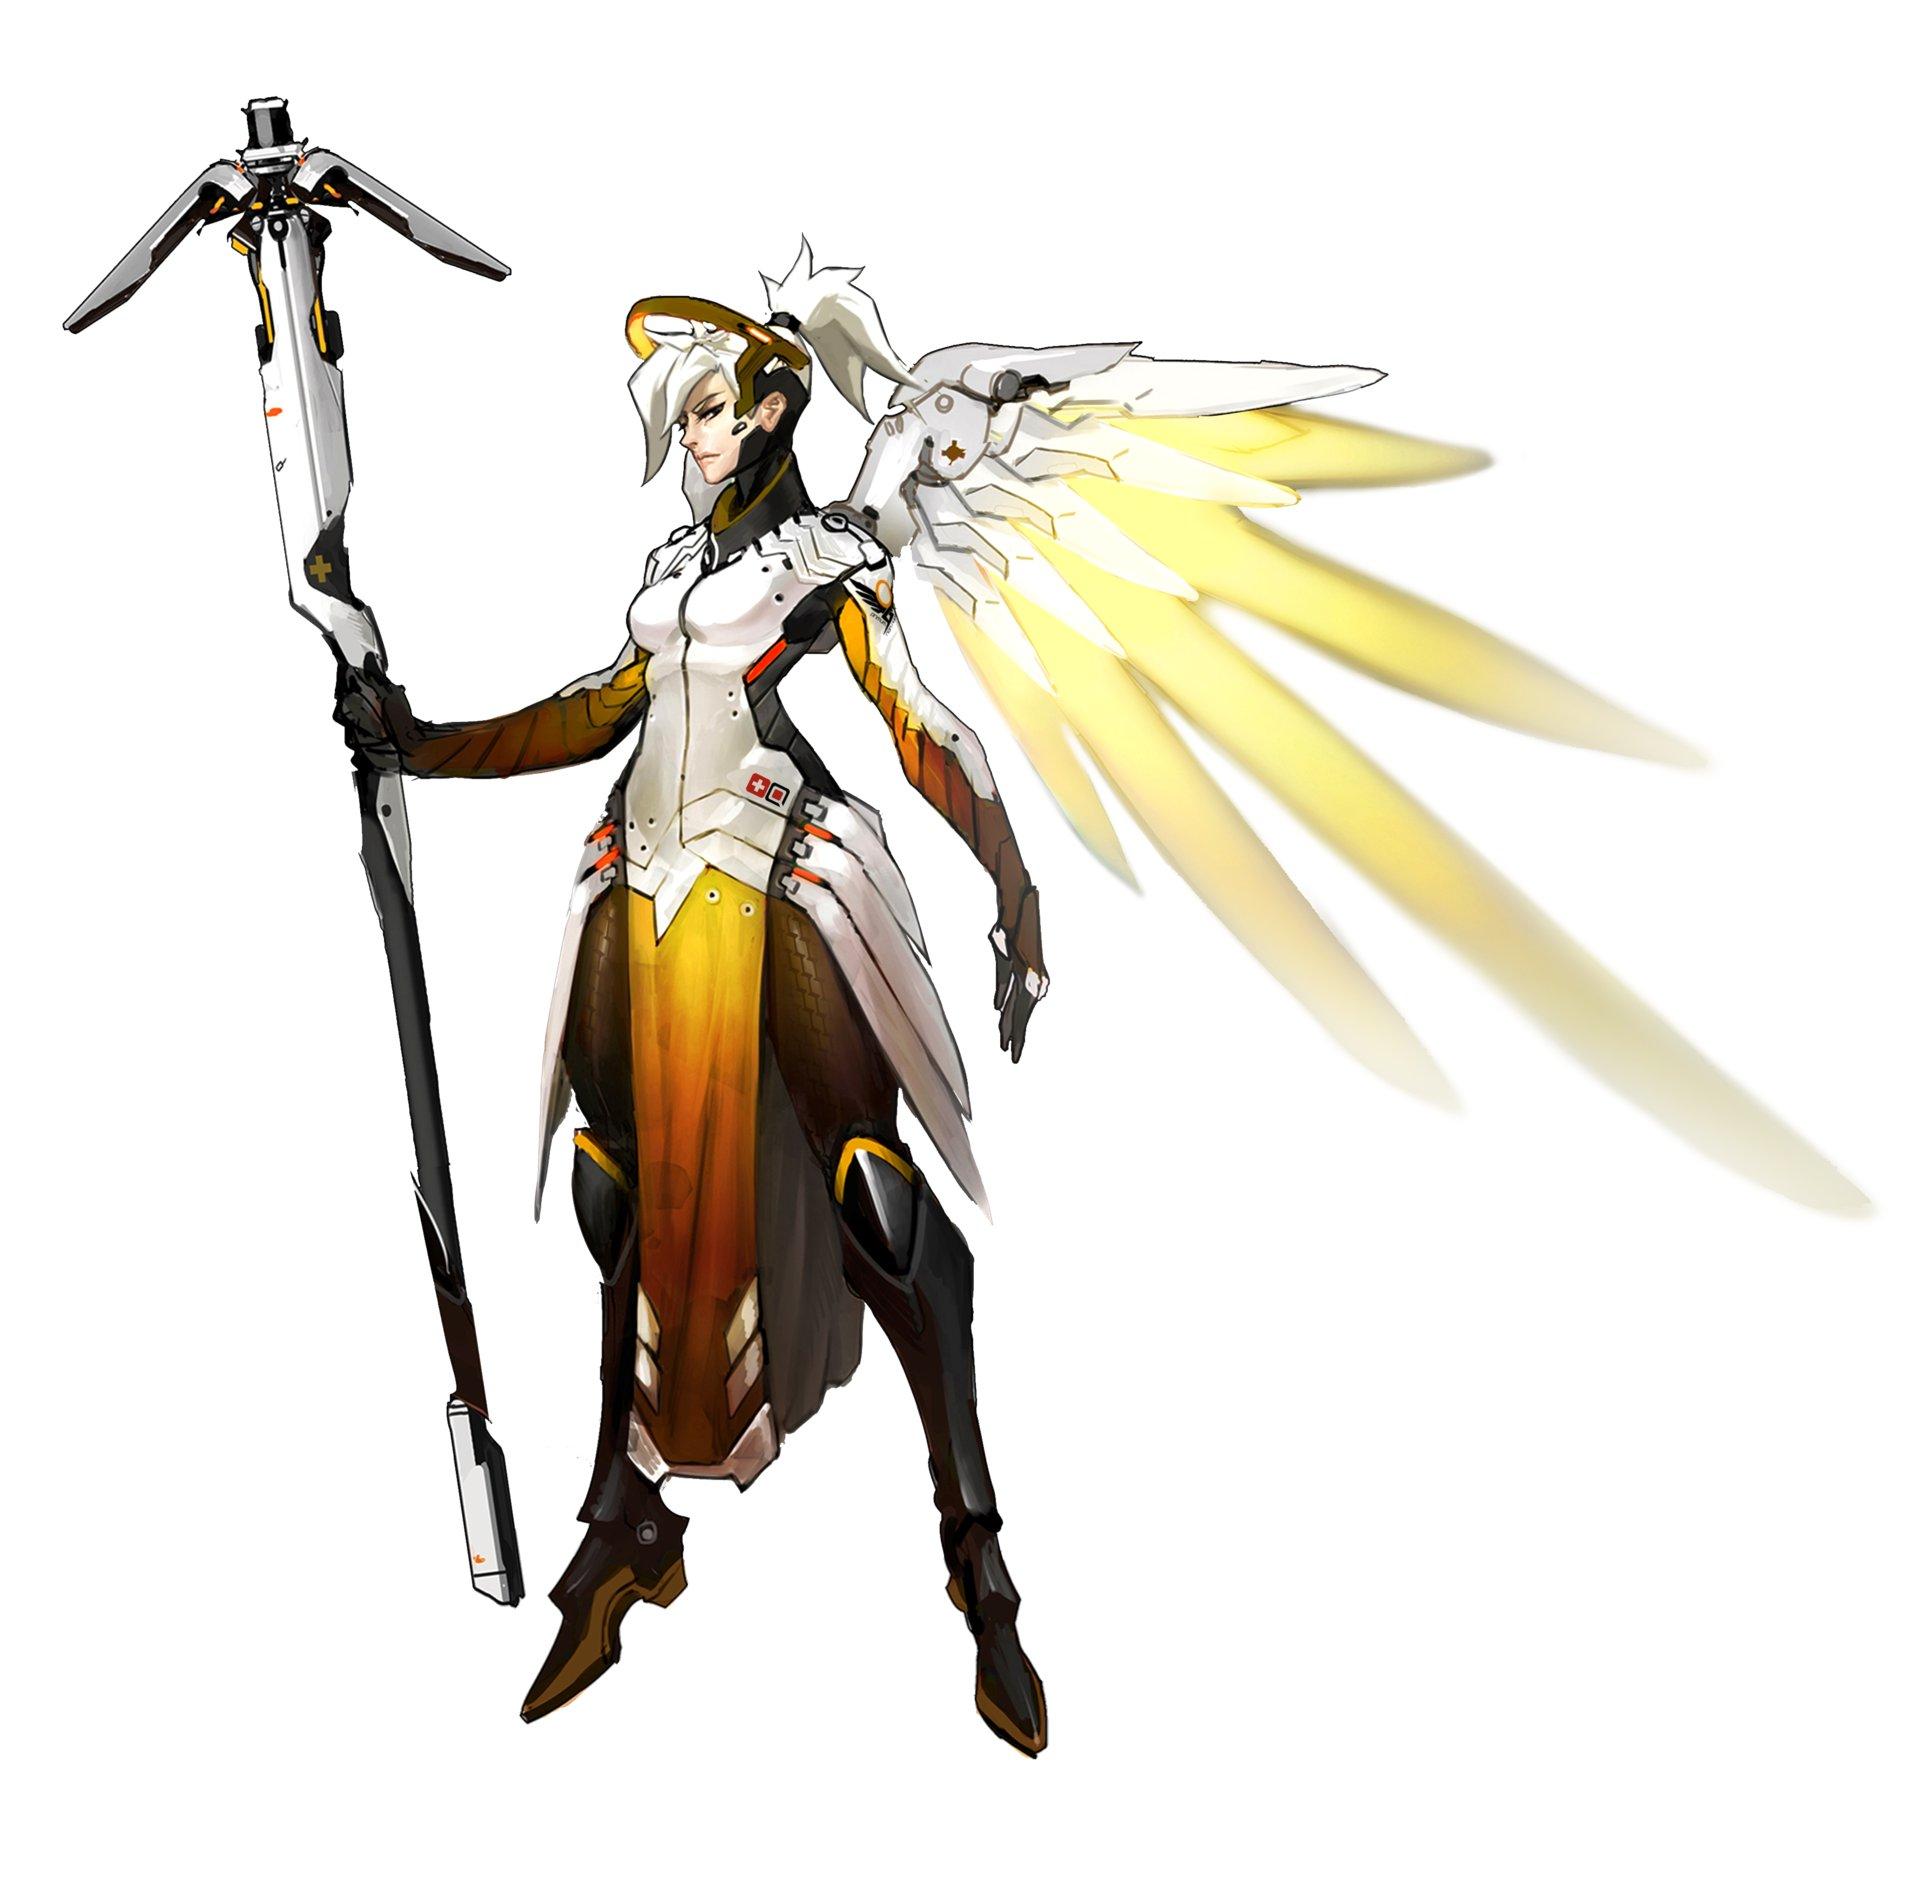 Mercy presskit